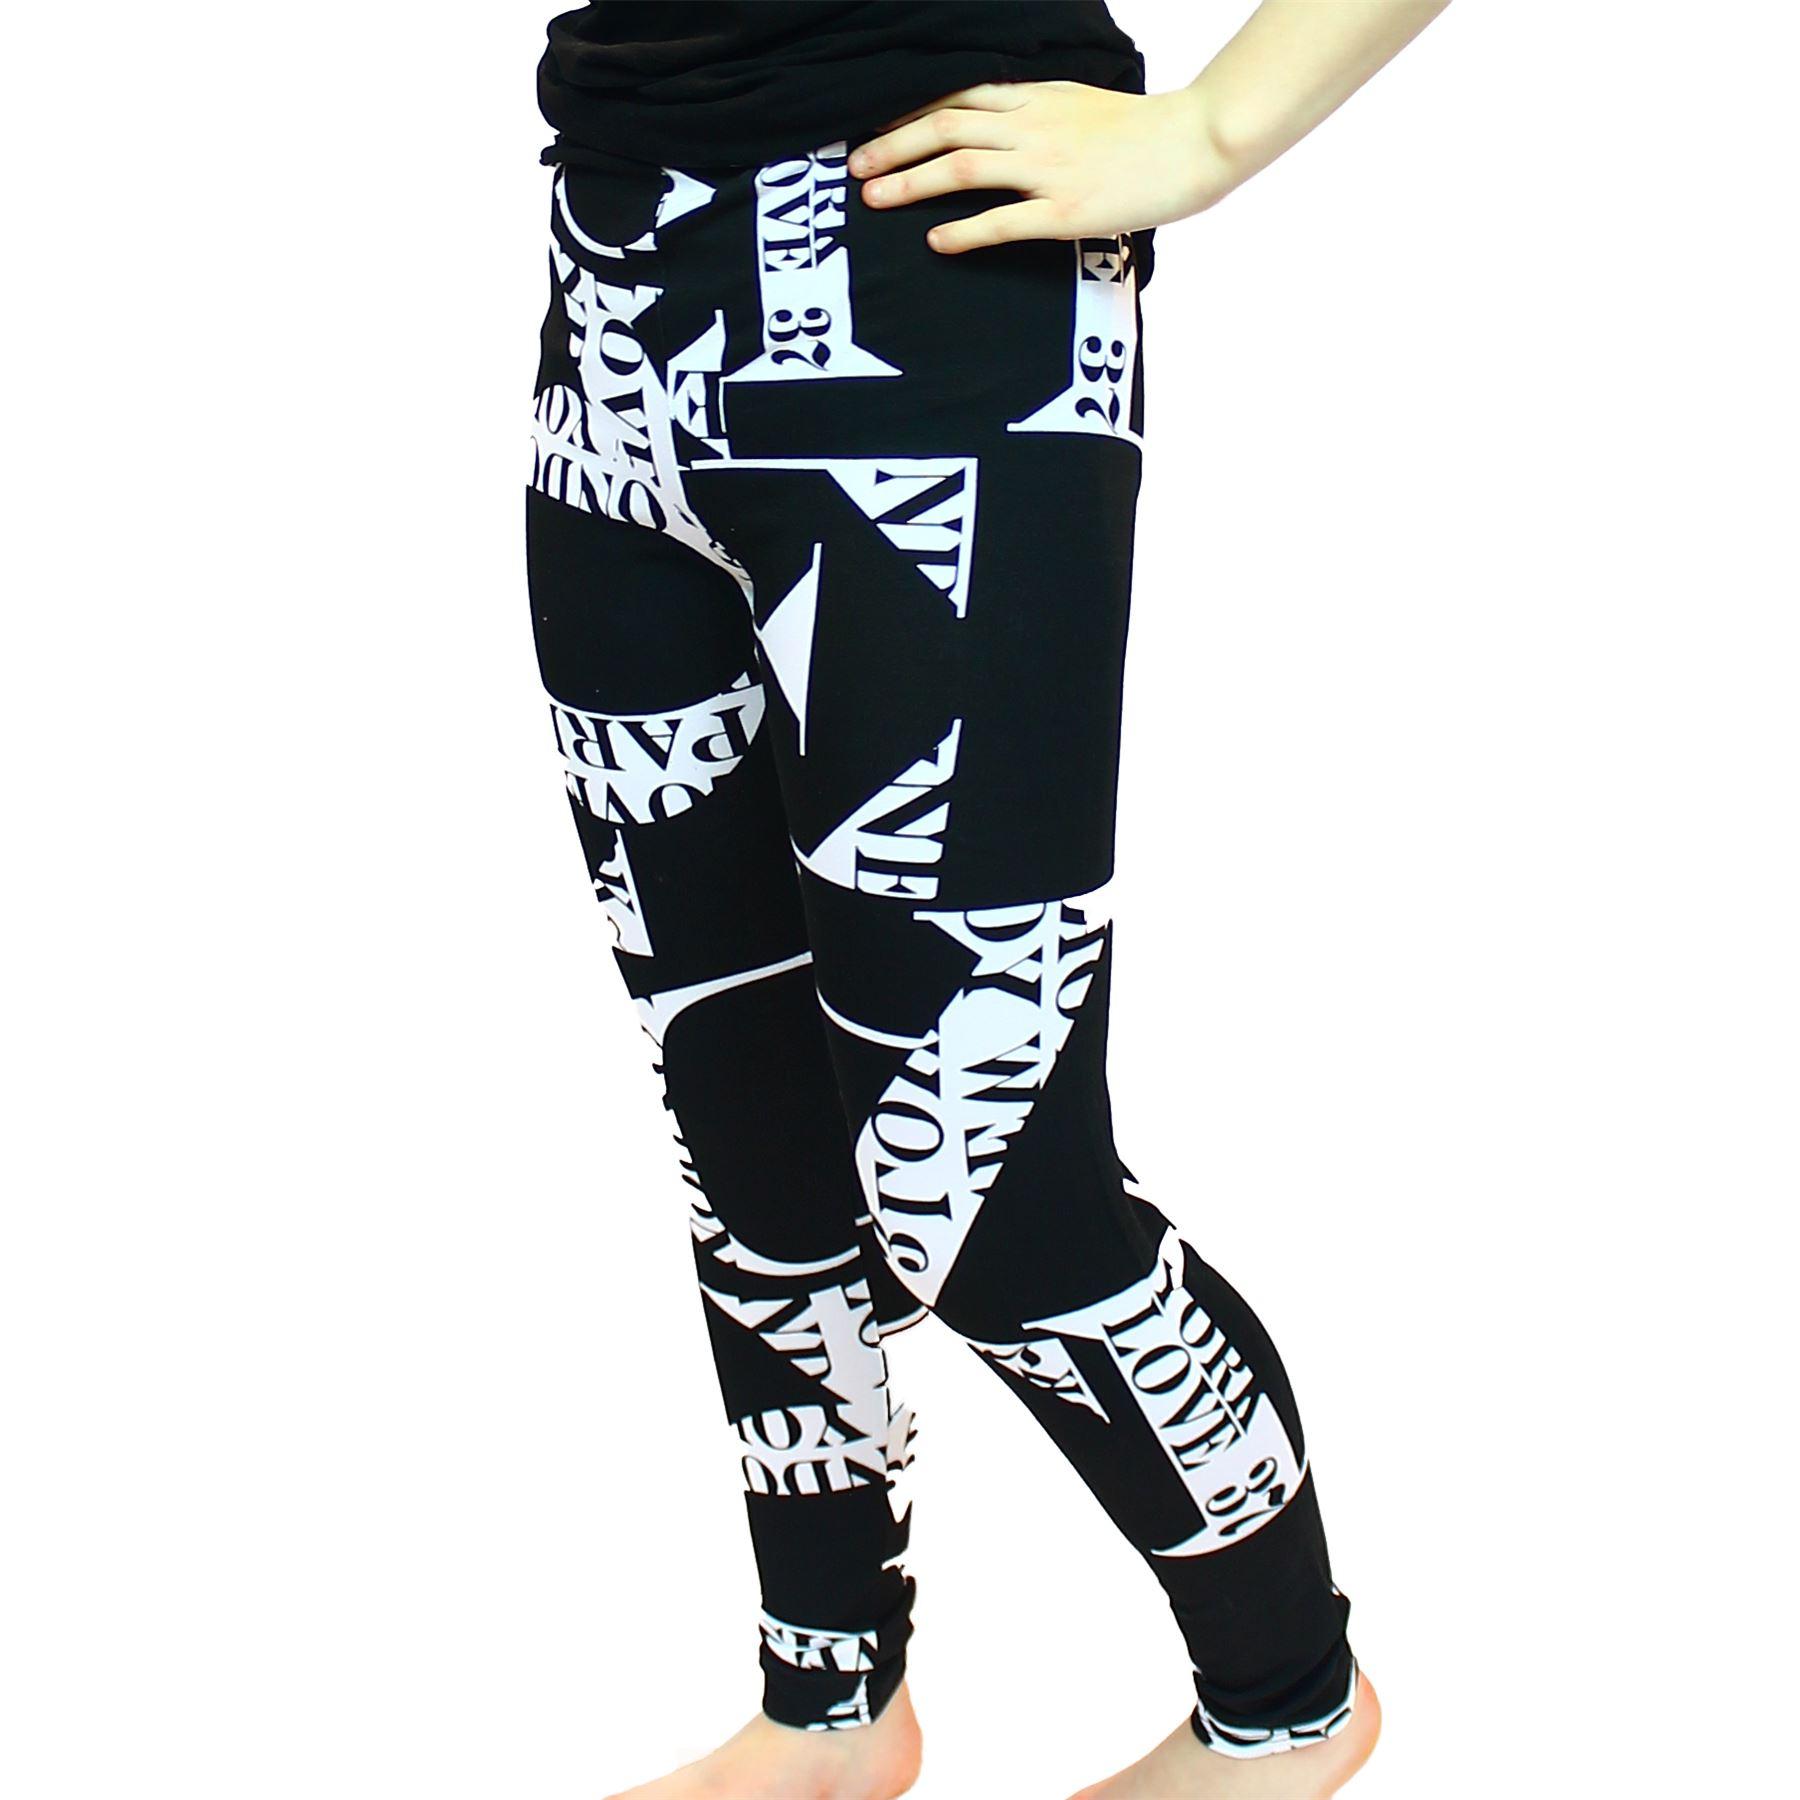 Plus Size Patterned Leggings Best Decorating